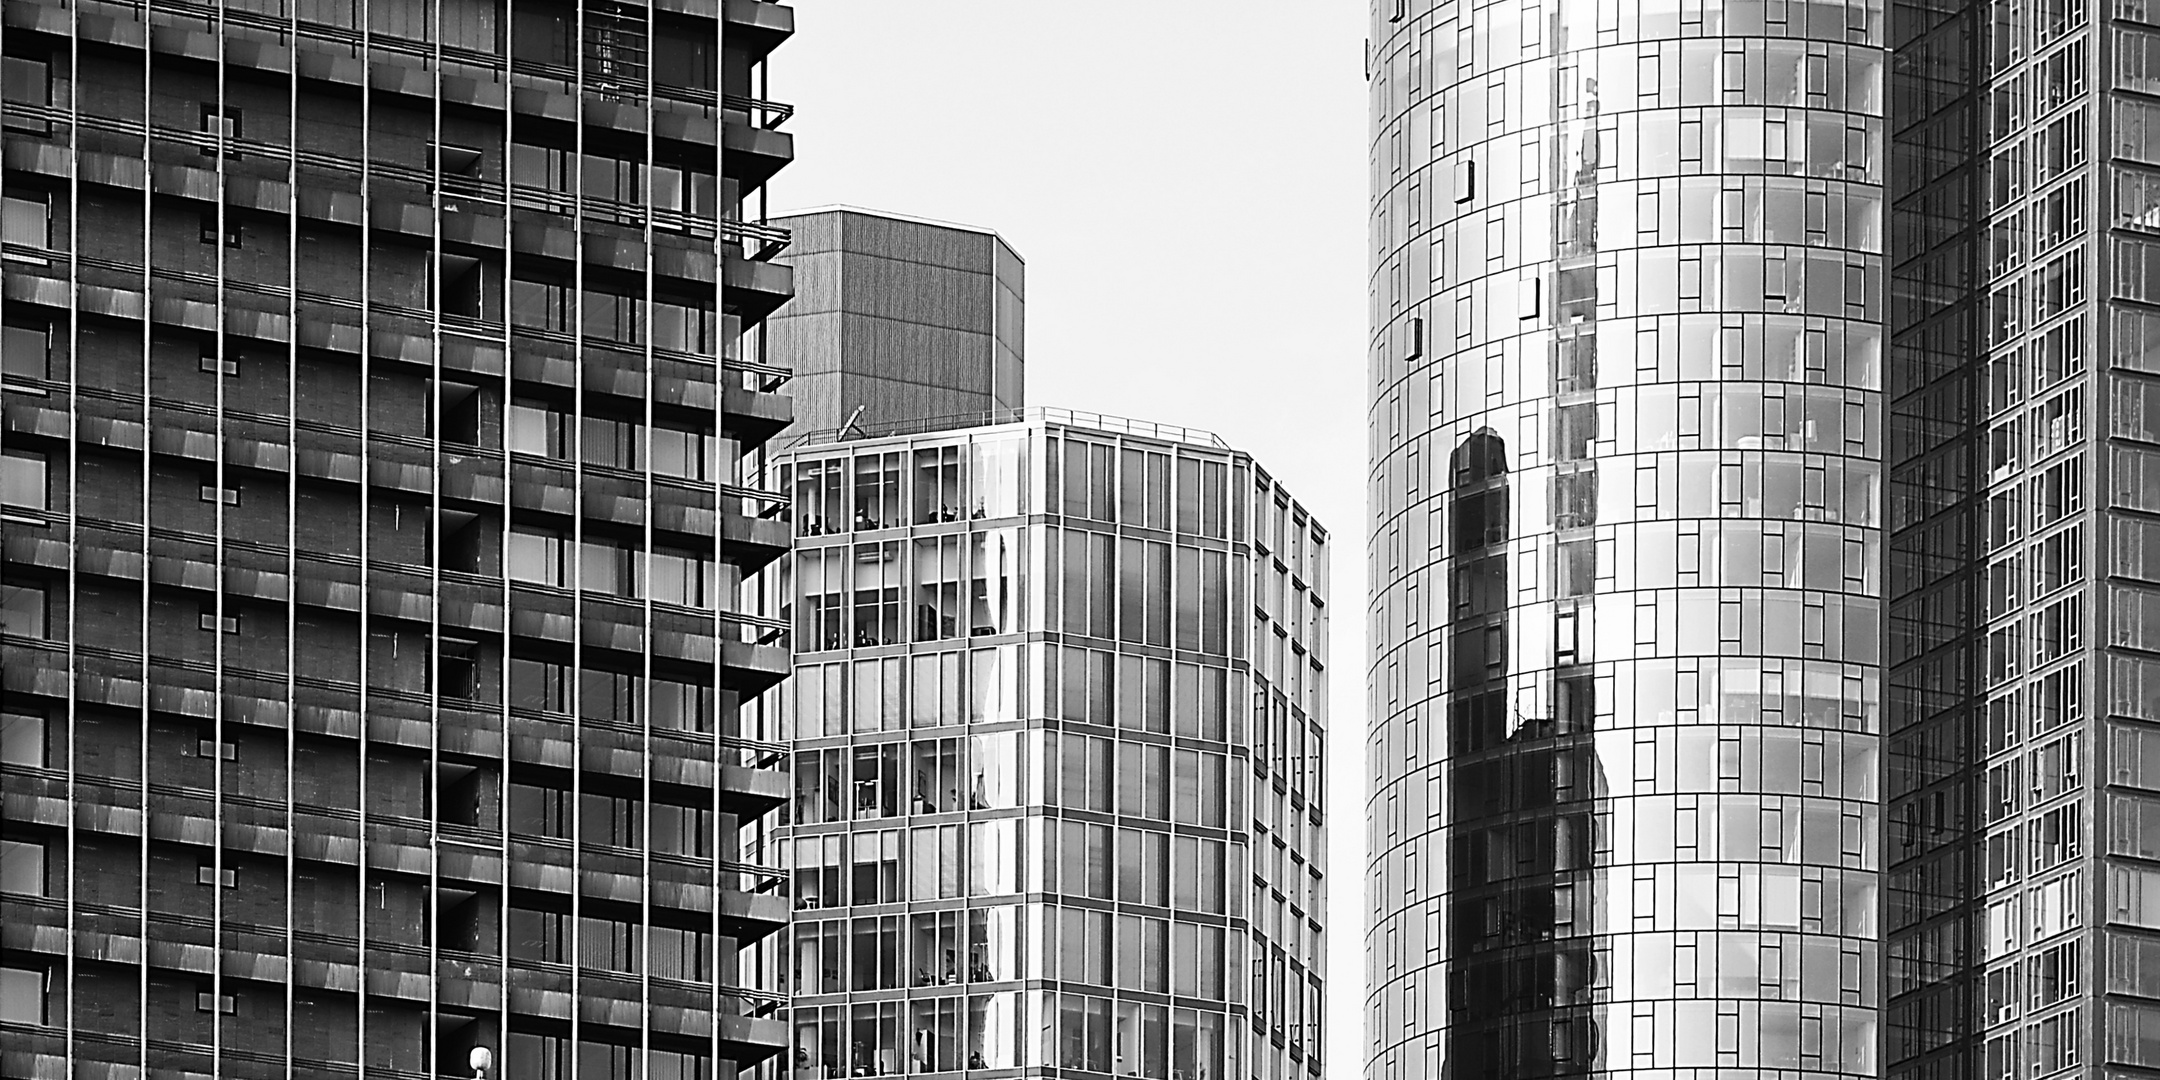 Hallo Frankfurt # 4957